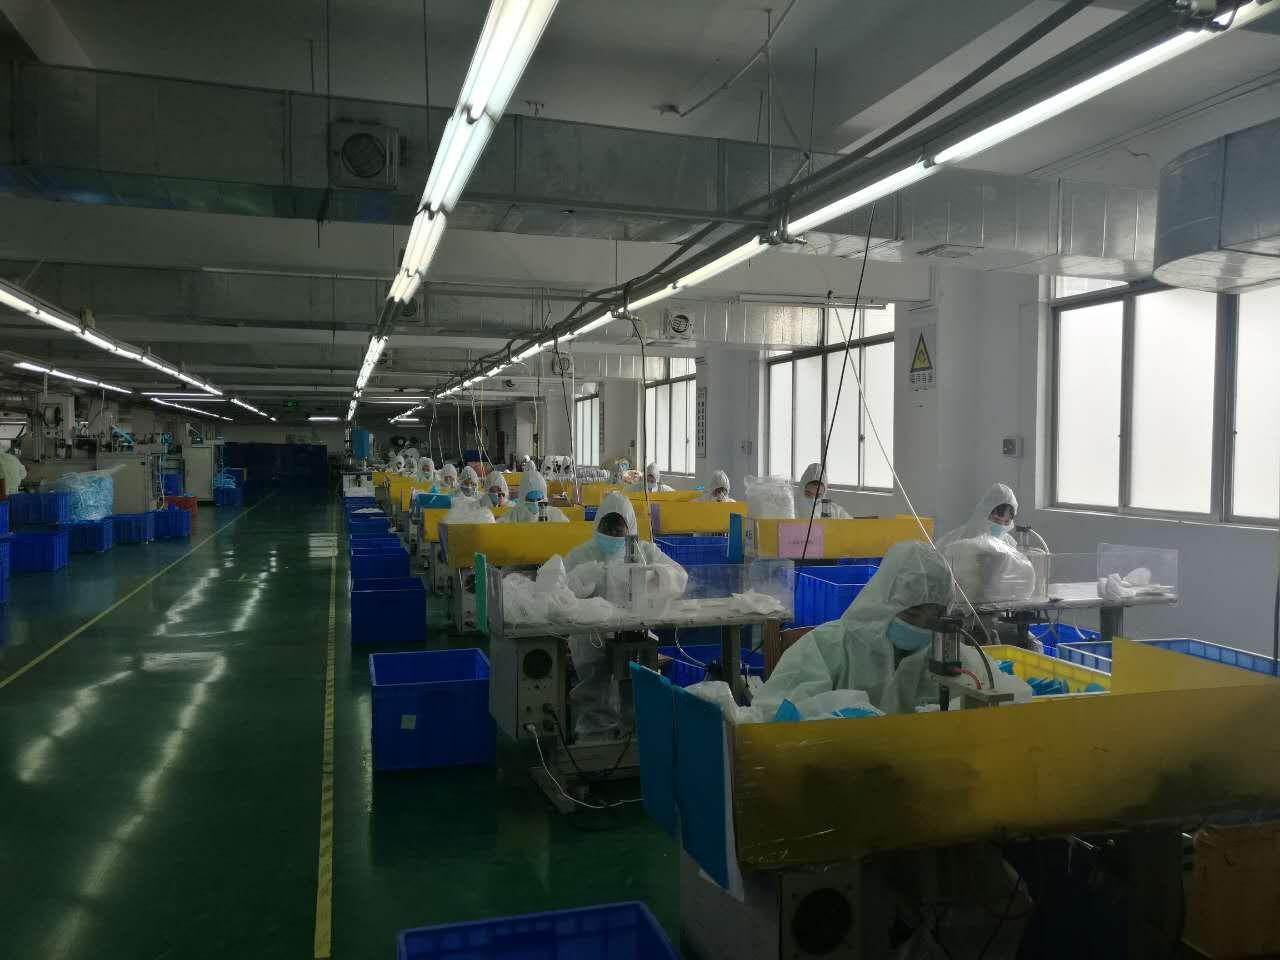 http://www.110tao.com/dianshanglingshou/145763.html